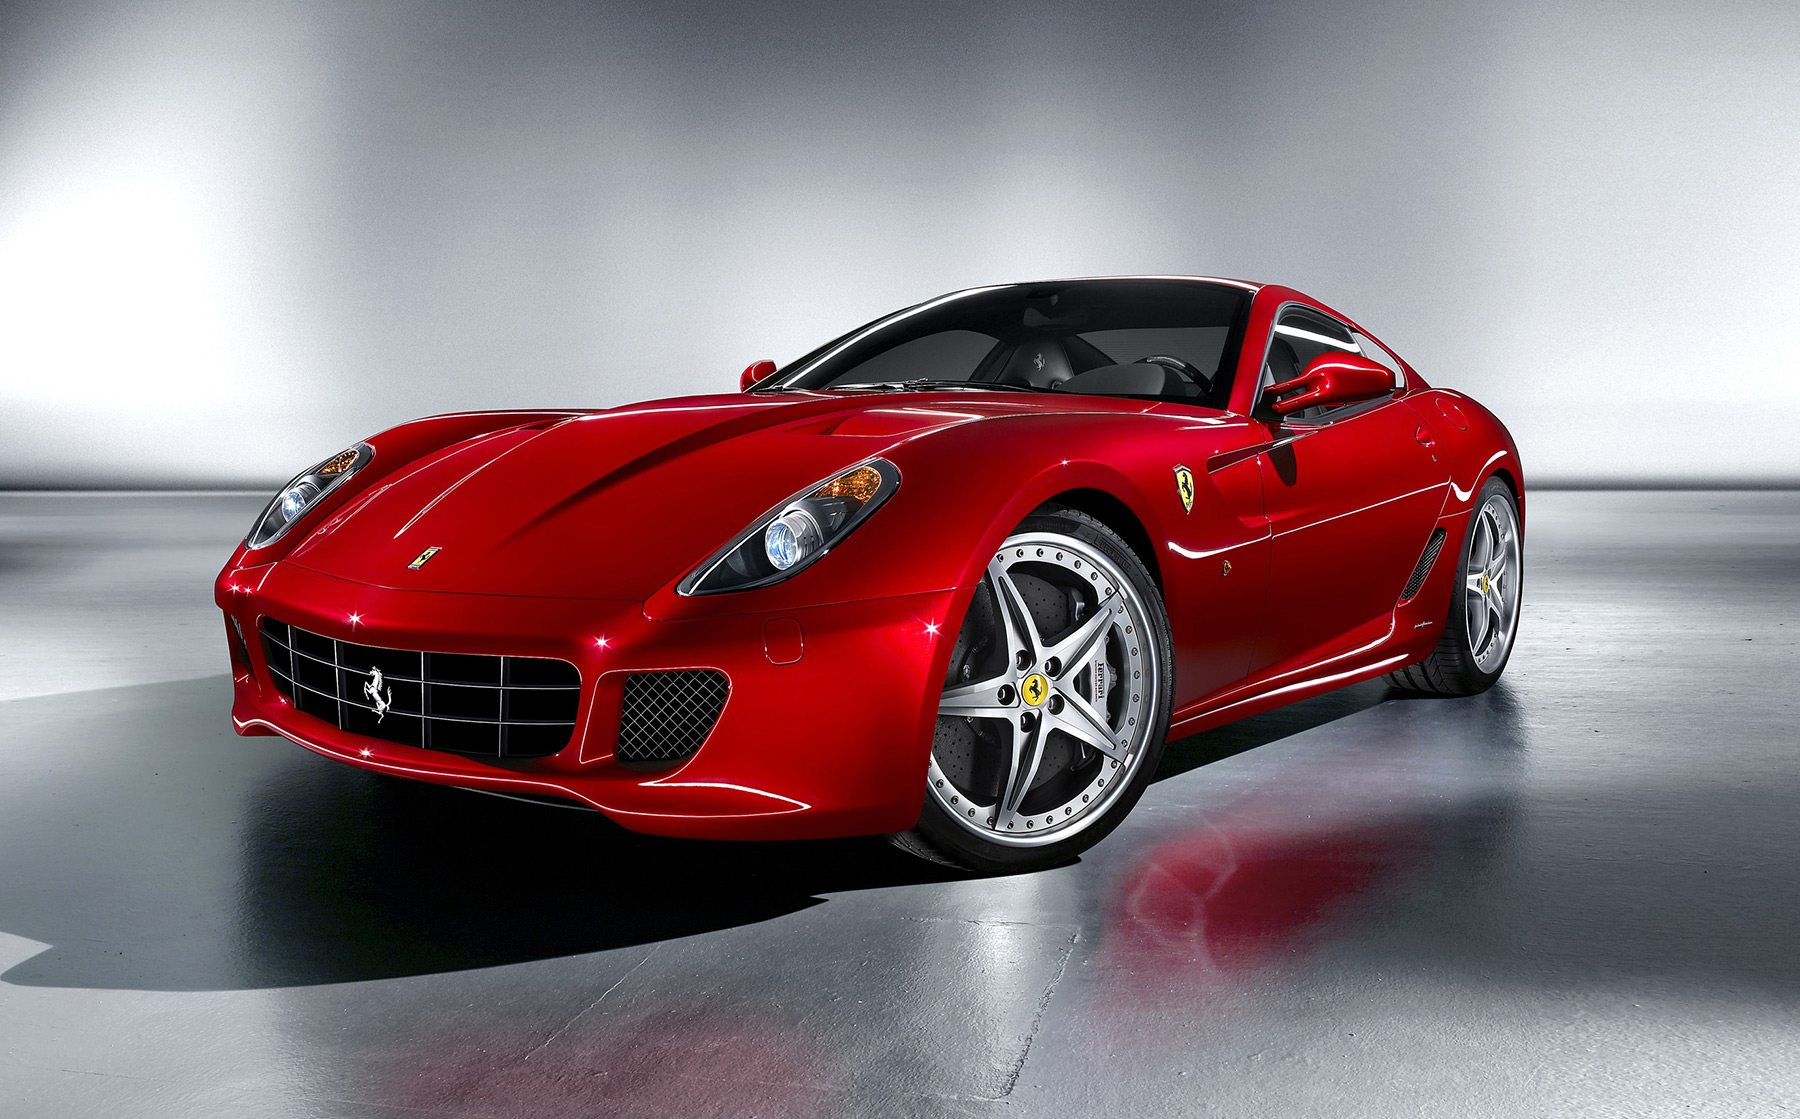 2018 ferrari 599. Wonderful Ferrari New And Used Ferrari 599 Prices Photos Reviews Specs  The Car  Connection To 2018 Ferrari 599 D